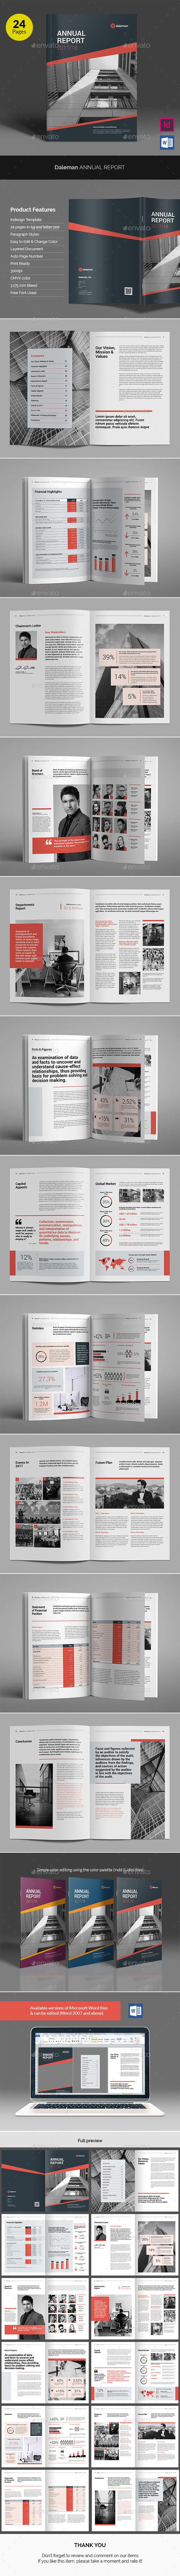 Daleman Annual Report v02 - Corporate Brochures